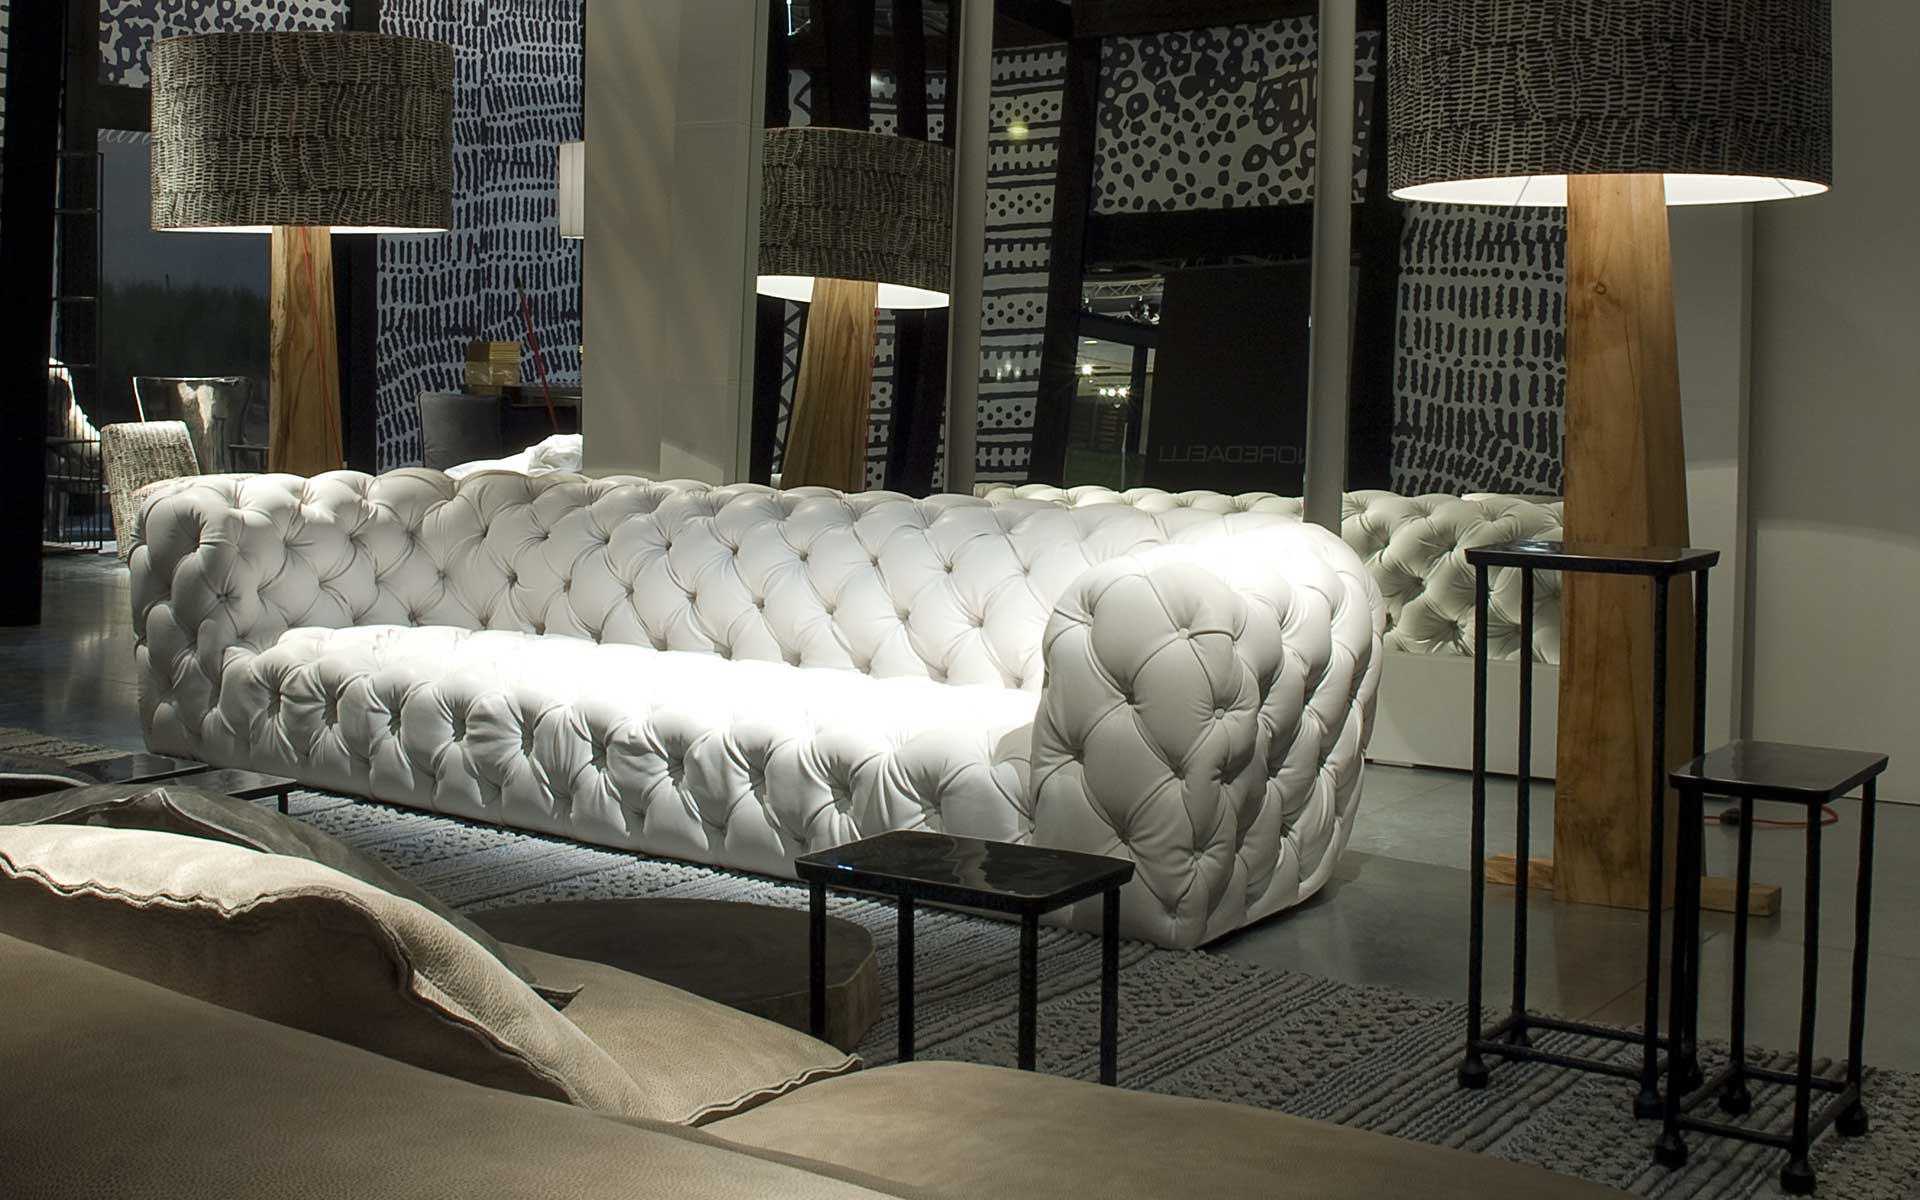 italia sofa rh resin furniture baxter from italy brings fine sofas home interior design